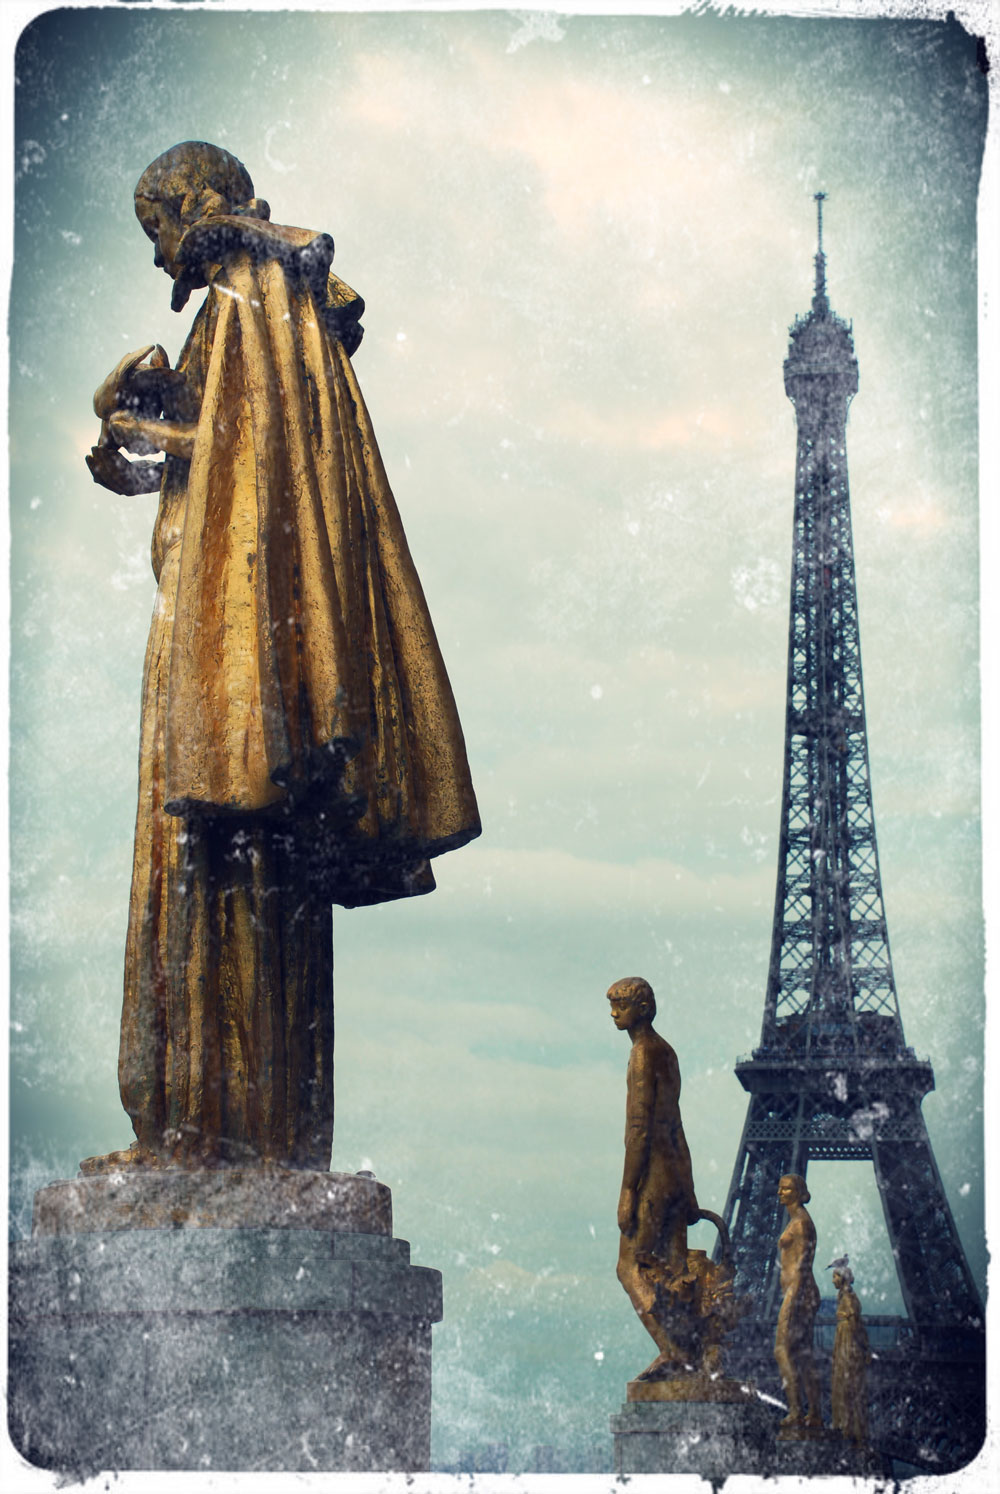 Trocadéro, Paris France